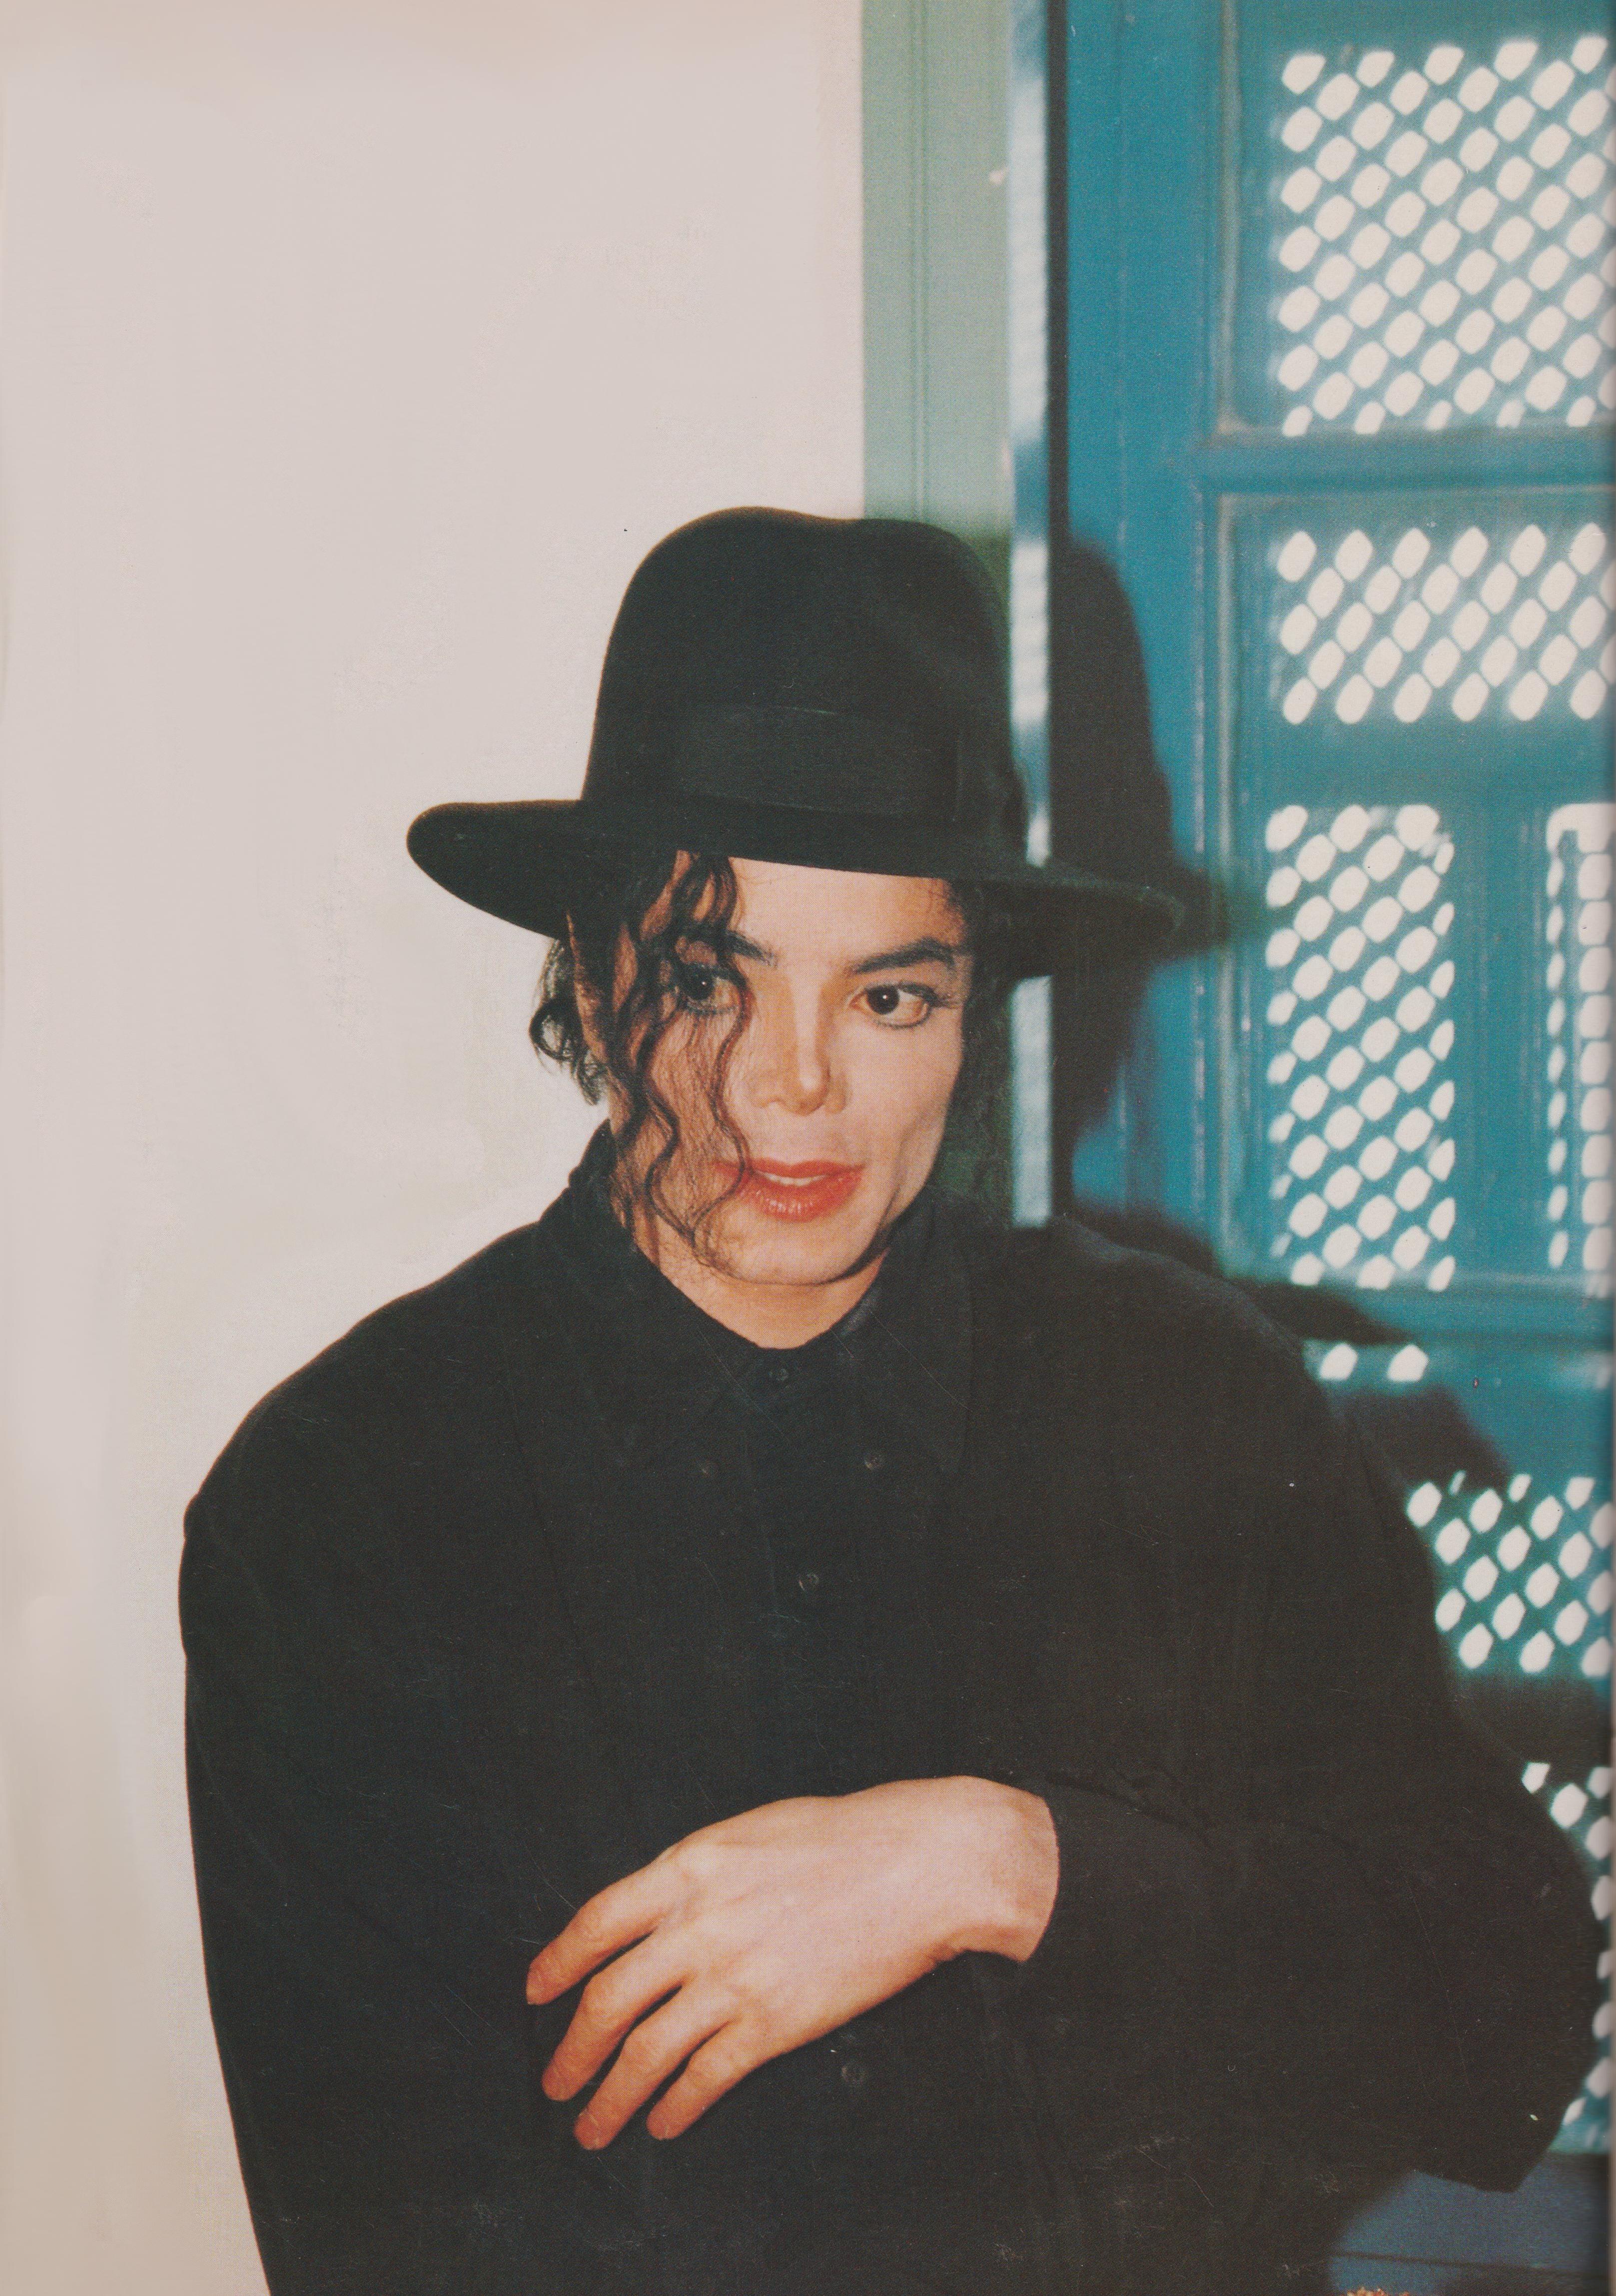 Michael Jackson - HQ Scan - Tunisia'96